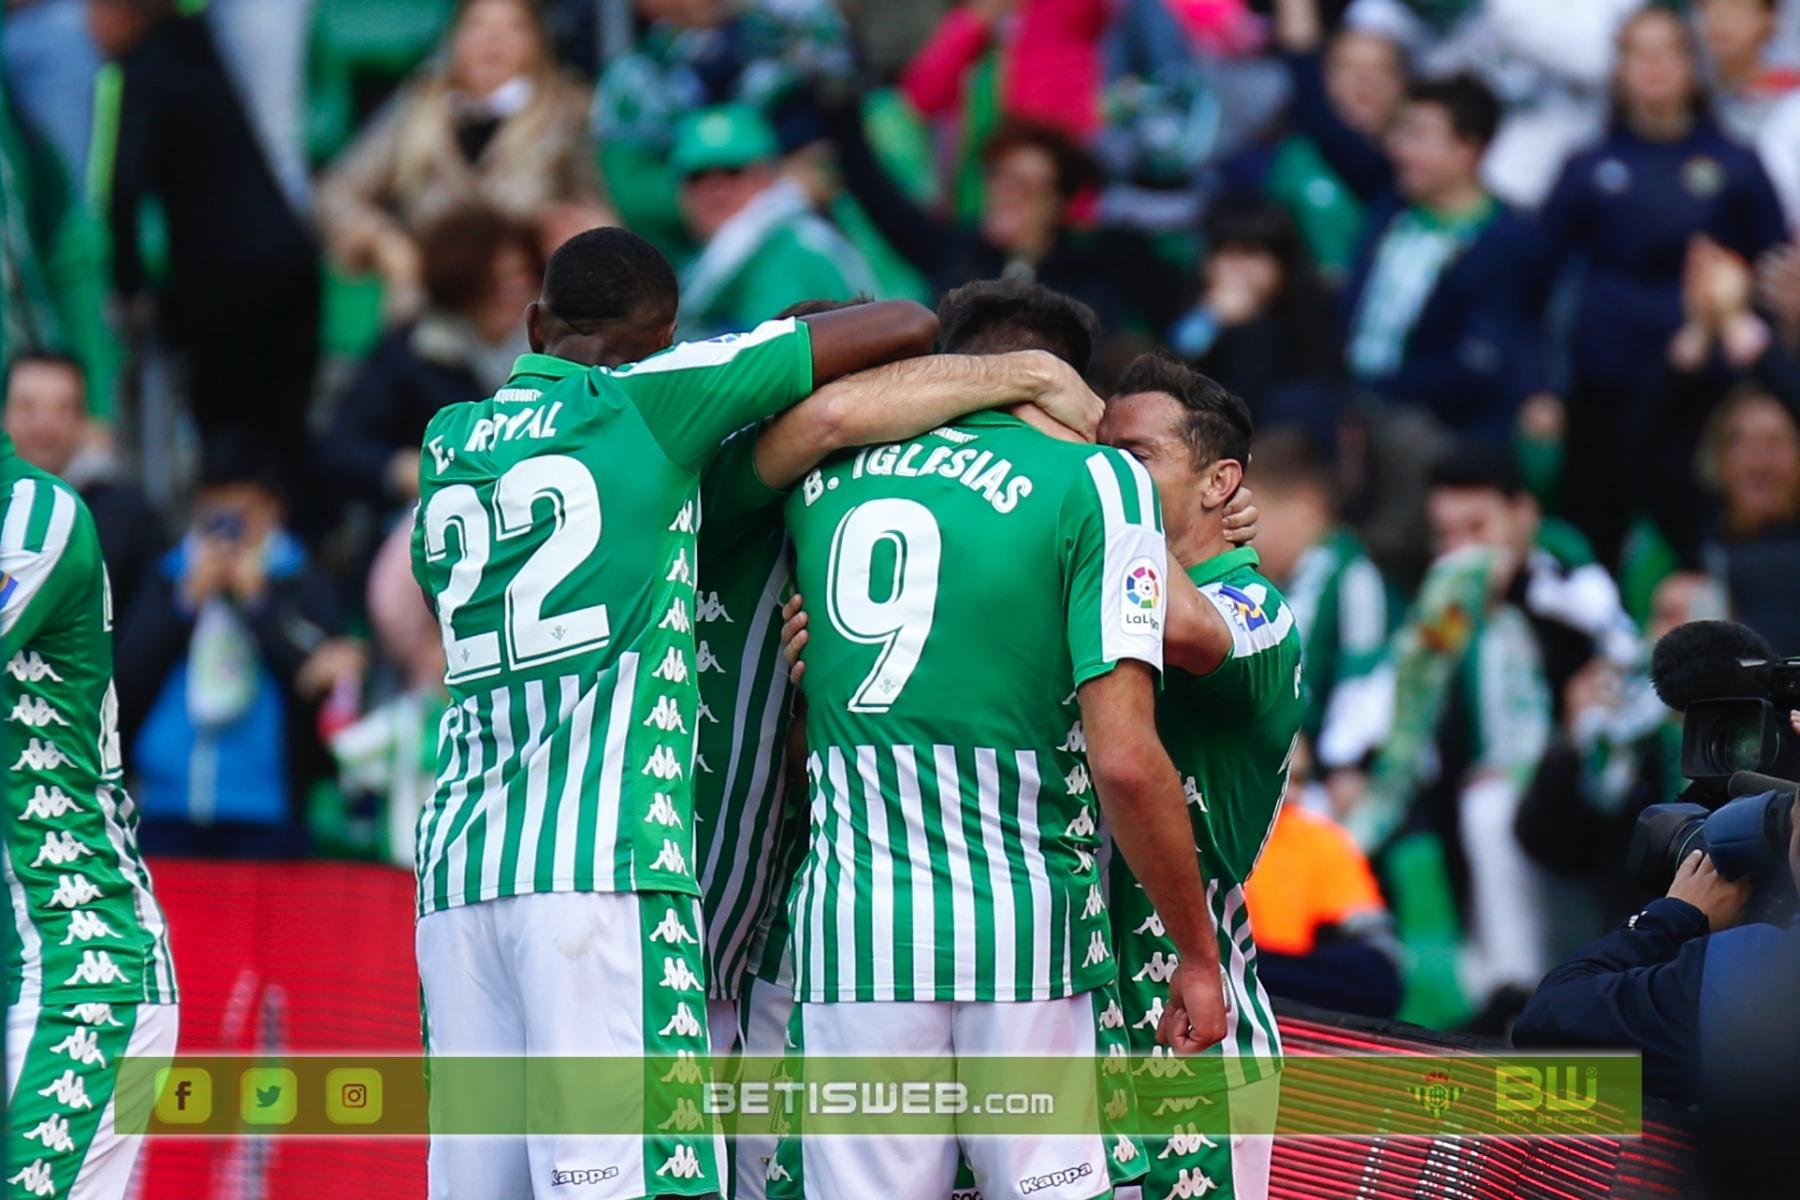 aJ20 Real Betis - Real Sociedad 26